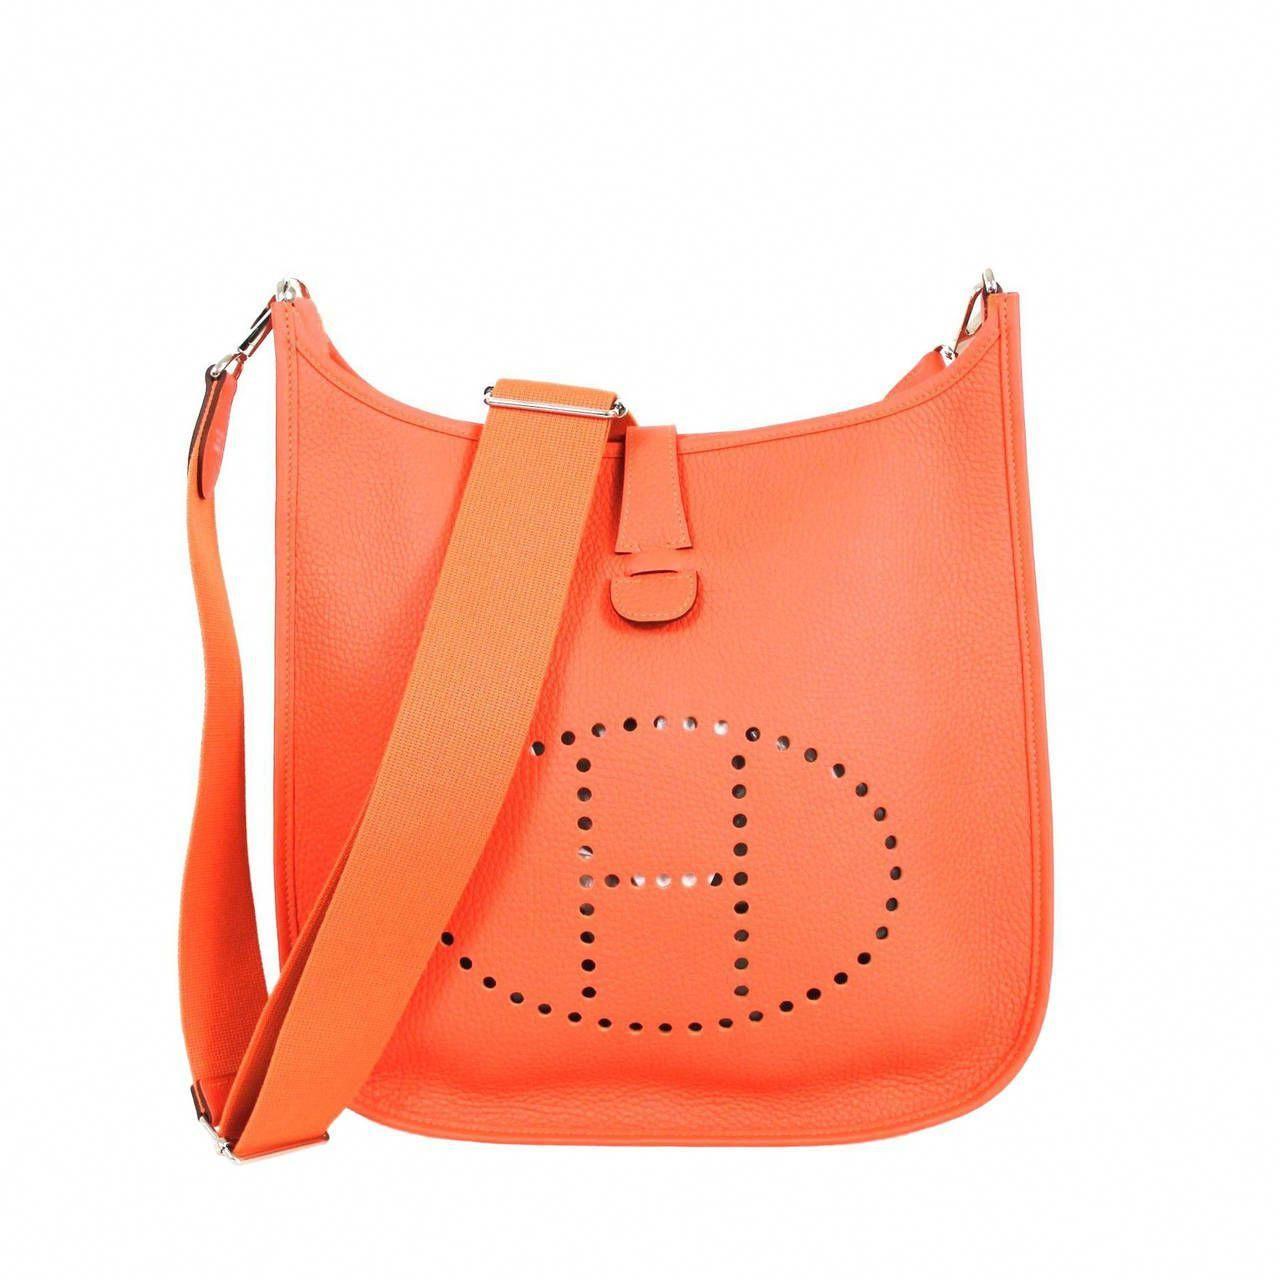 7792226264c Hermès Orange Taurillon  3